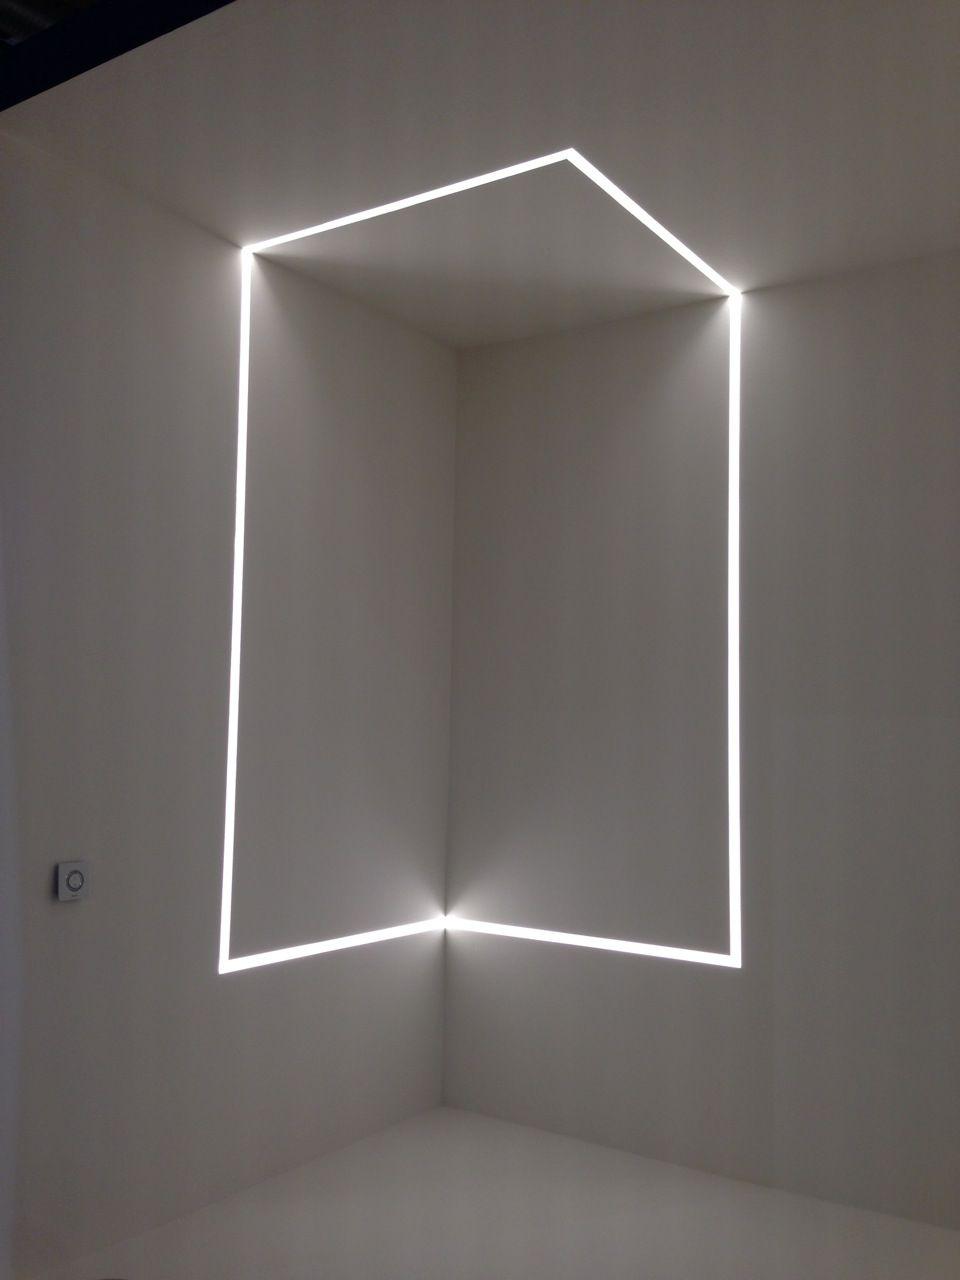 The running magnet light installation by flos architectural at the running magnet light installation by flos architectural at euroluce 2013 parisarafo Gallery